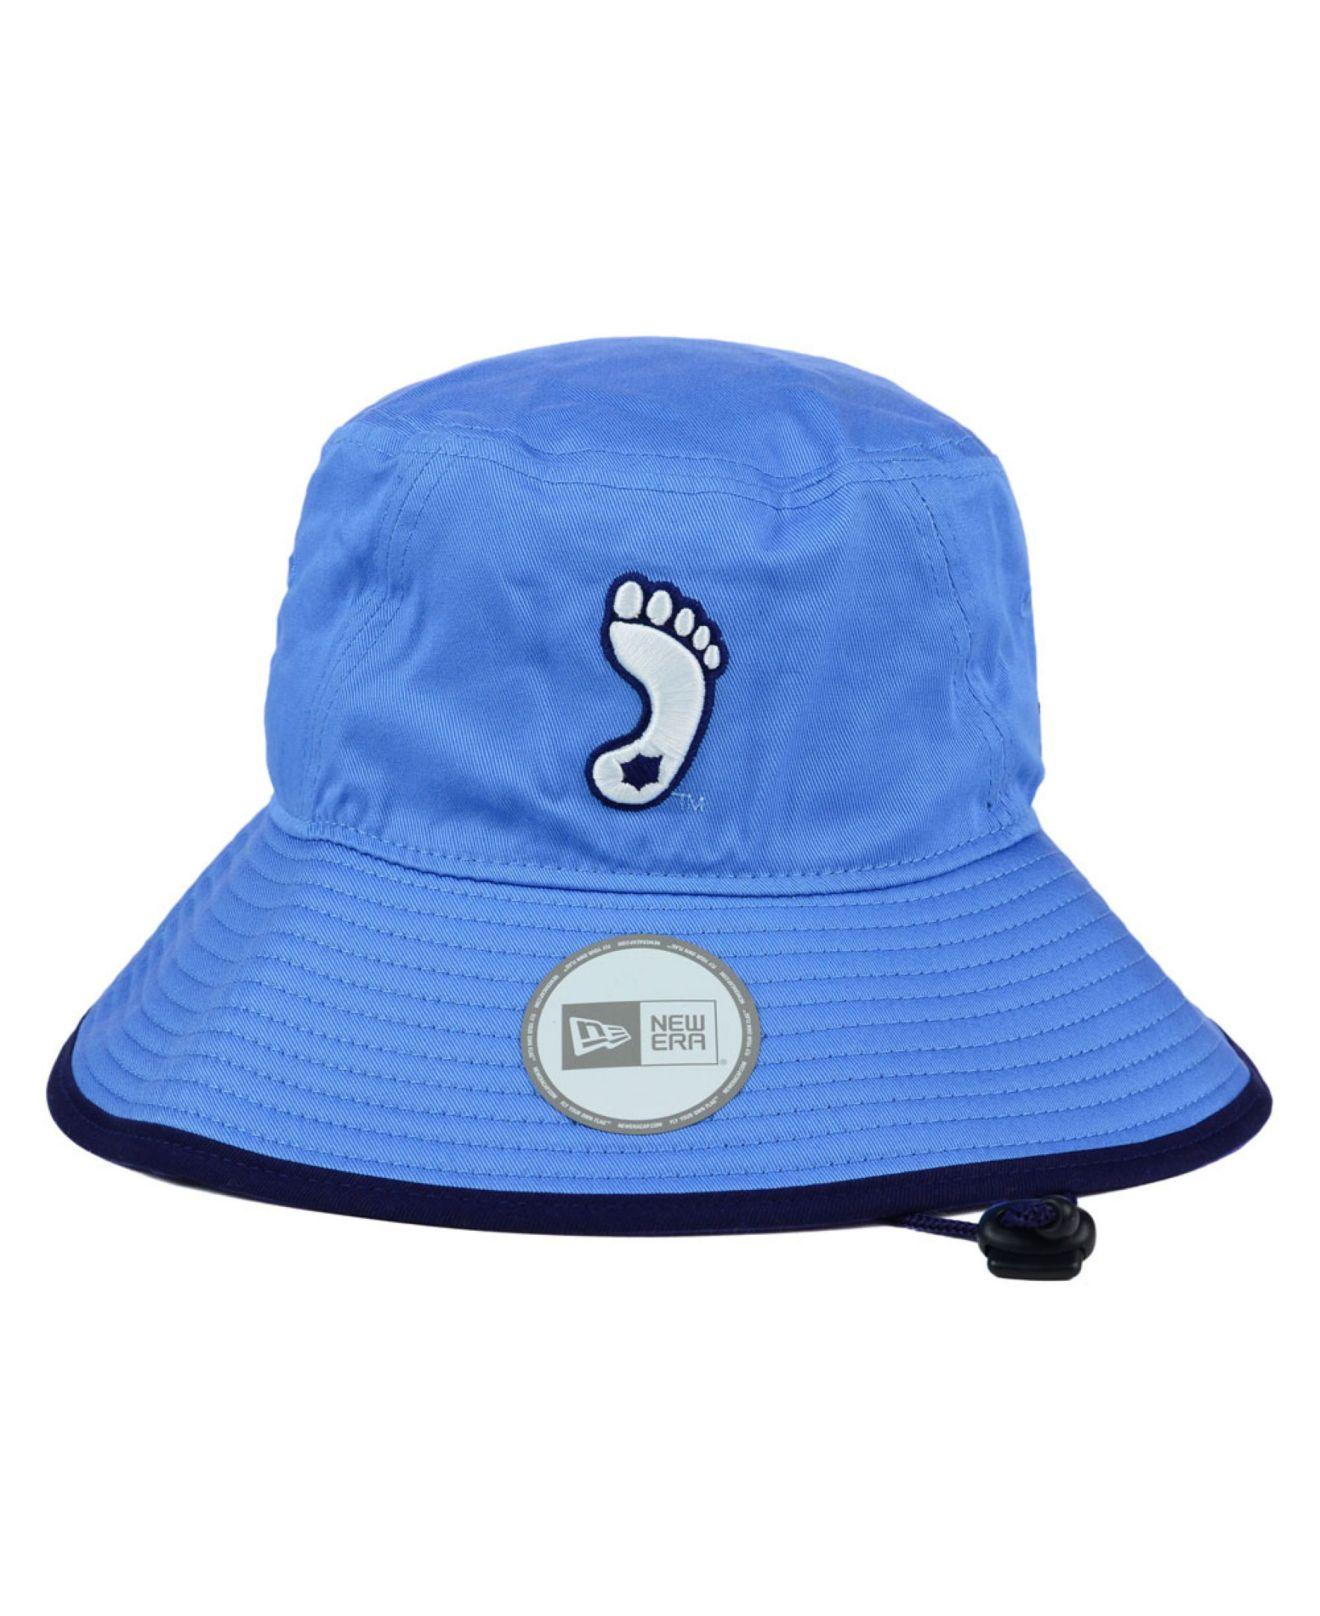 673798ffbb4 ... low cost lyst ktz north carolina tar heels tip bucket hat in blue for  men 17b64 ...